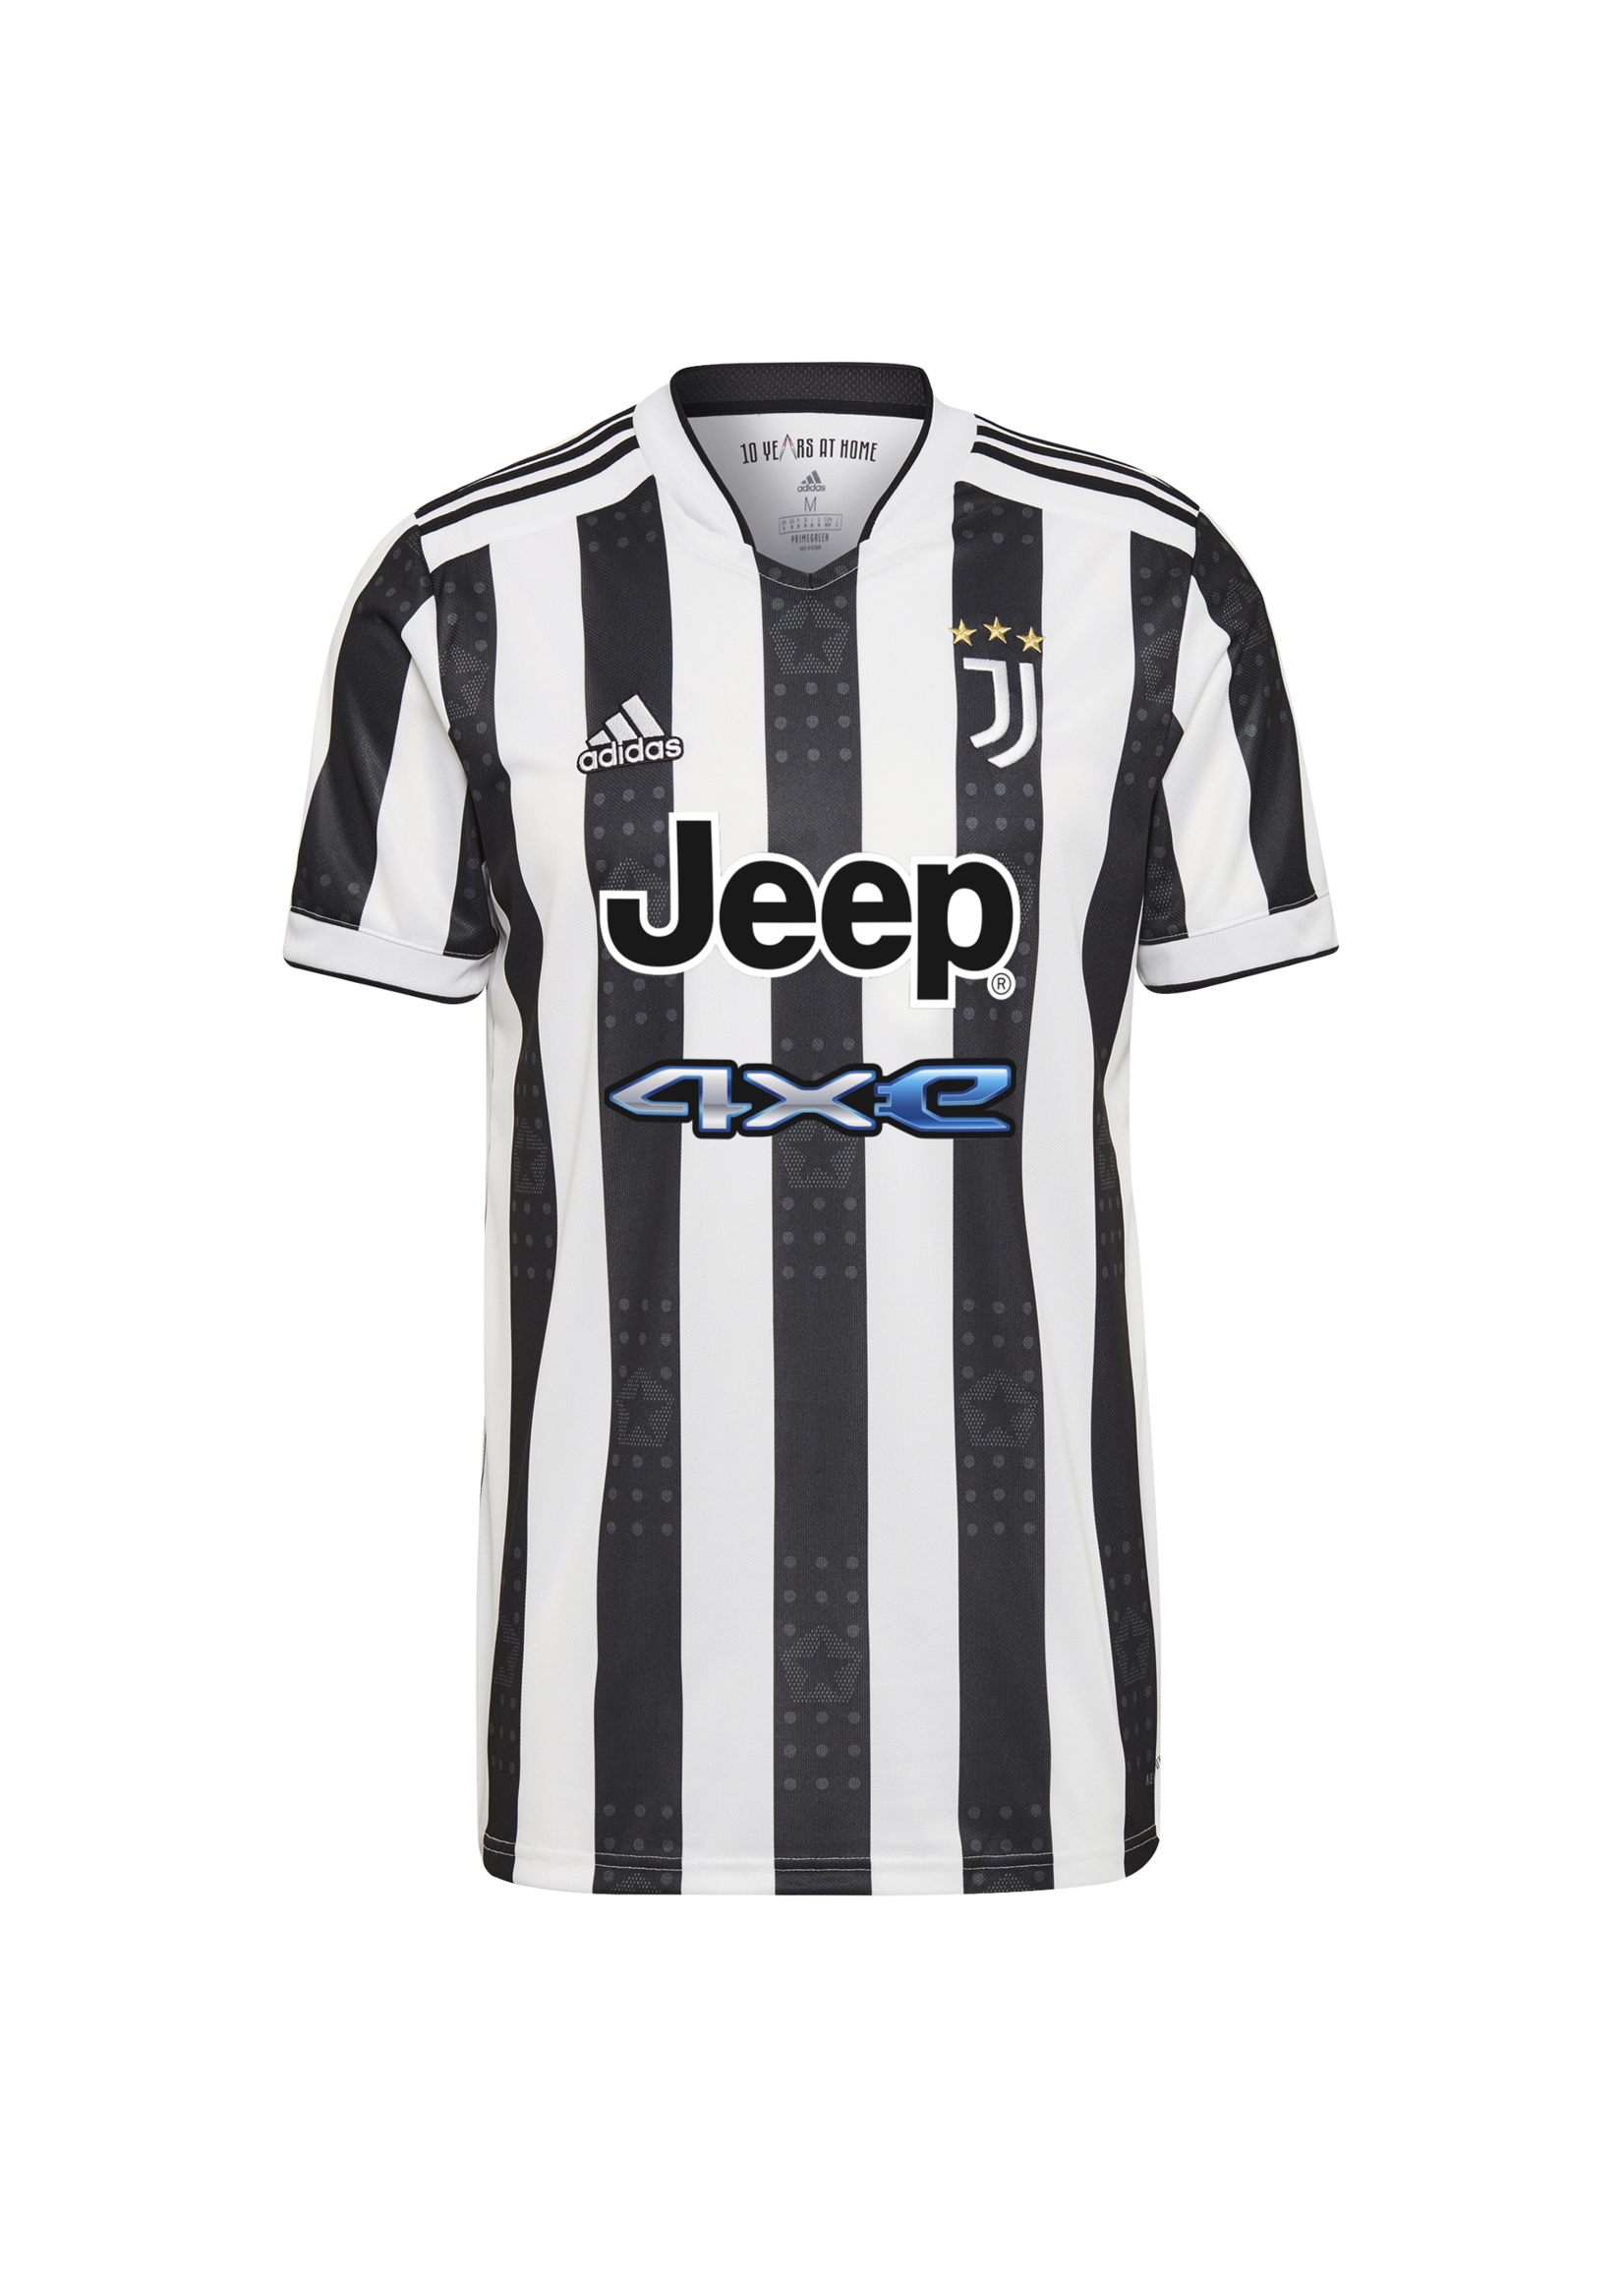 Adidas Juventus 21/22 Home Jersey Adult